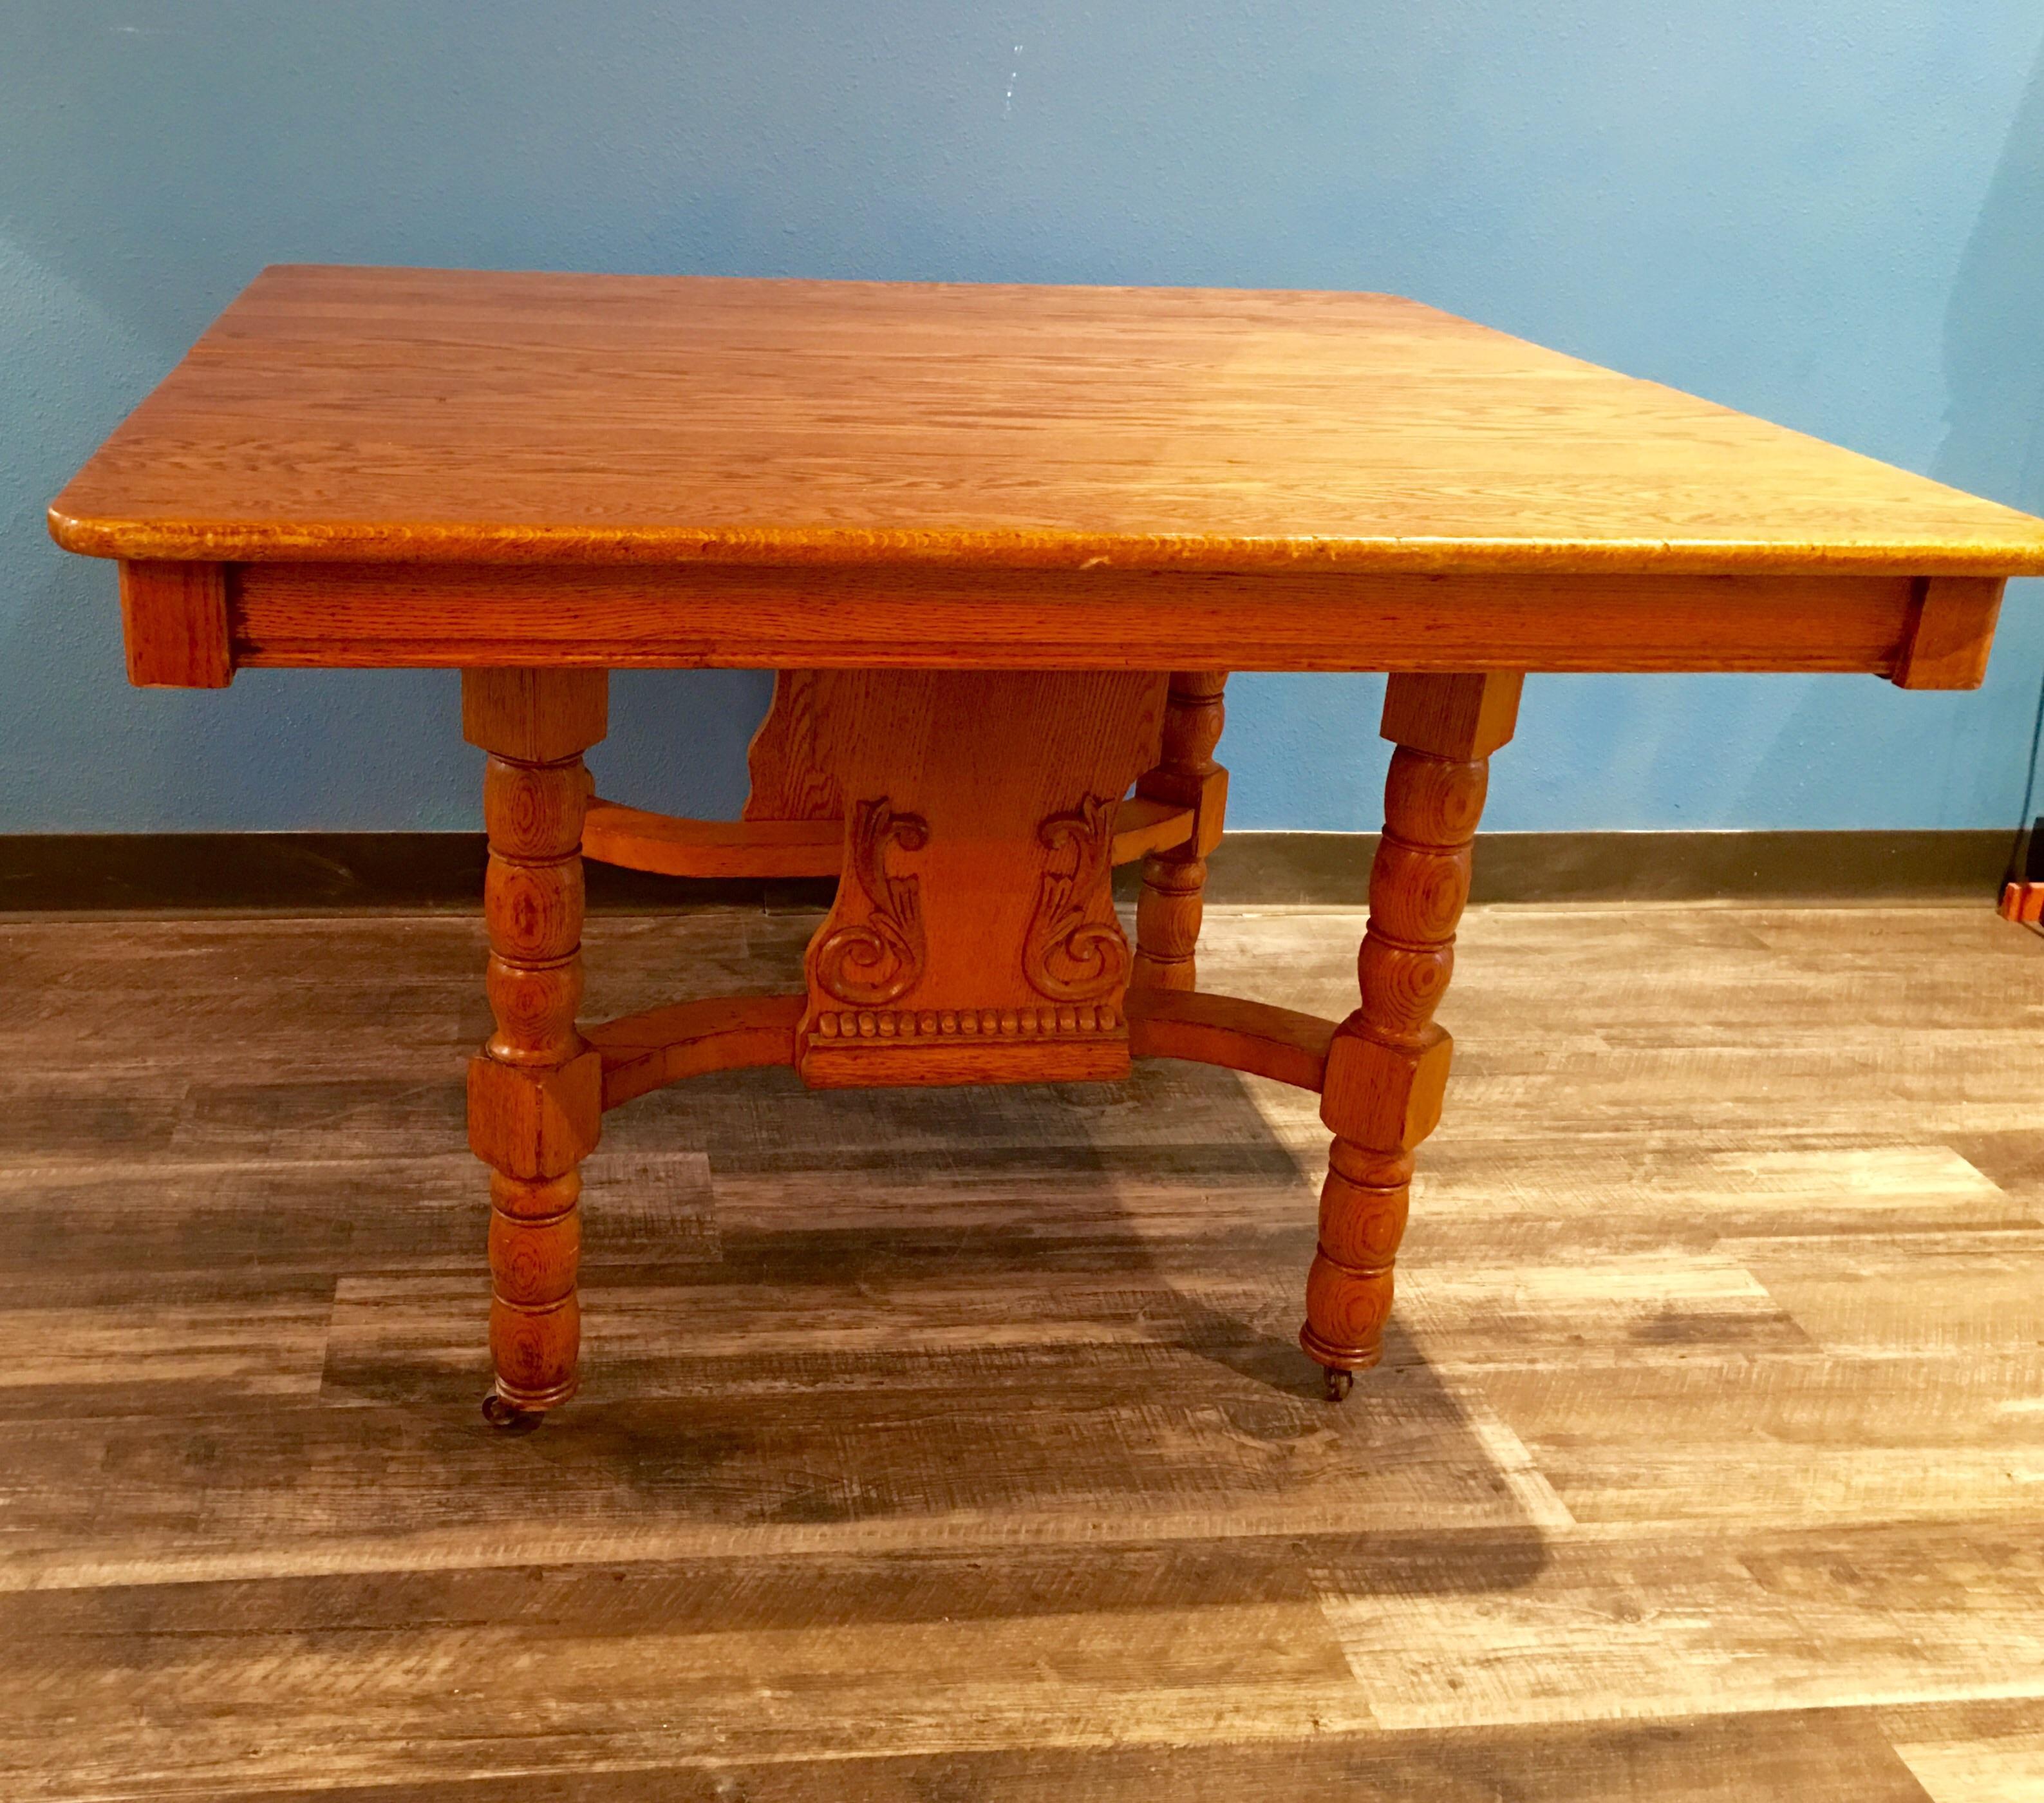 Antique Eastlake Oak Dining Table Chairish : a605b27e a706 4cdd aa45 751e67ccbd53aspectfitampwidth640ampheight640 from www.chairish.com size 640 x 640 jpeg 58kB